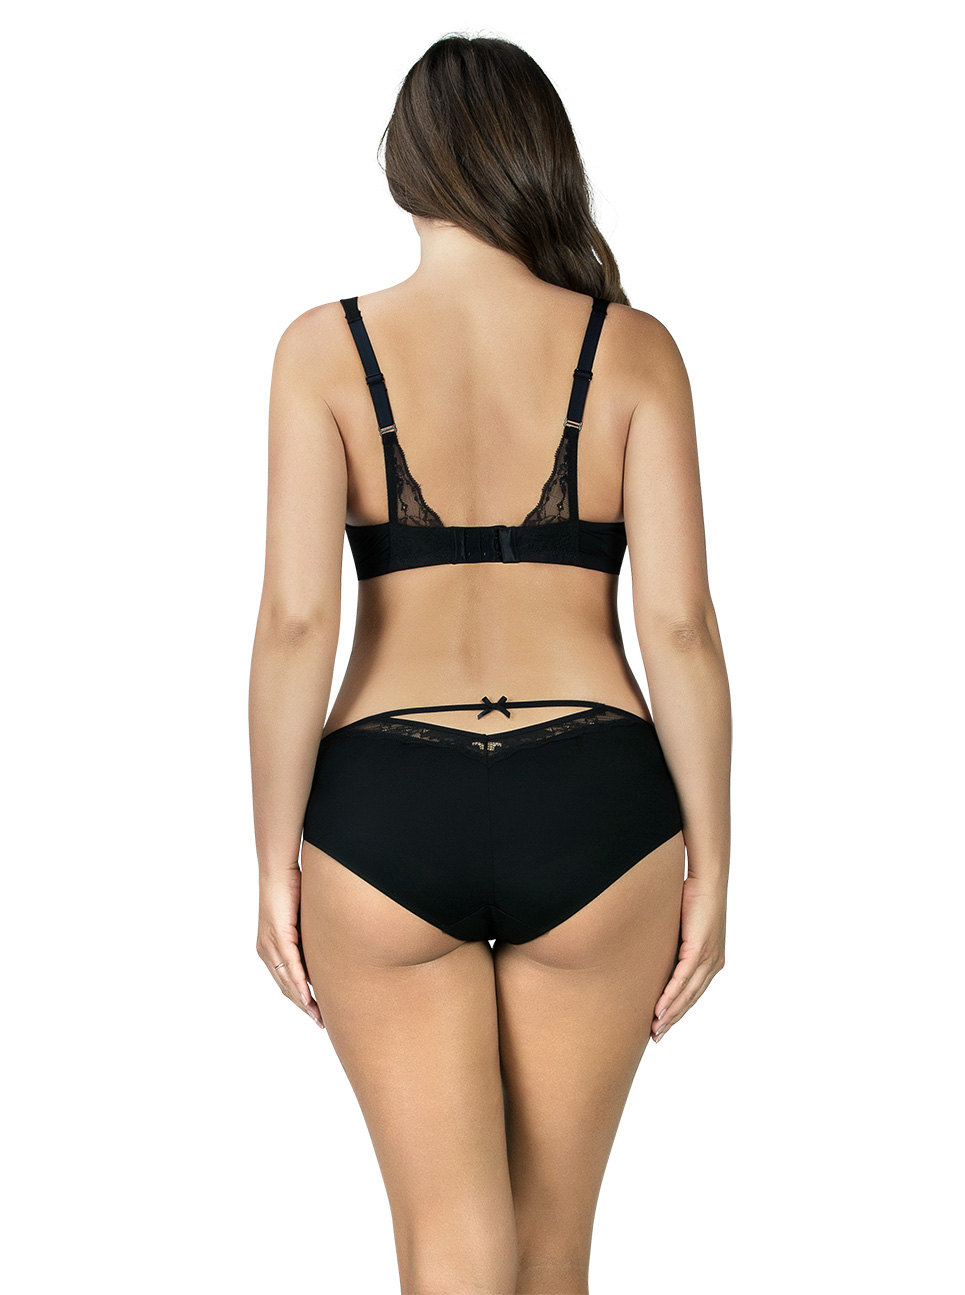 PARFAIT Aubrey PaddedBra P5761 Bikini P5763 Black Back - Aubrey Bikini Black P5763